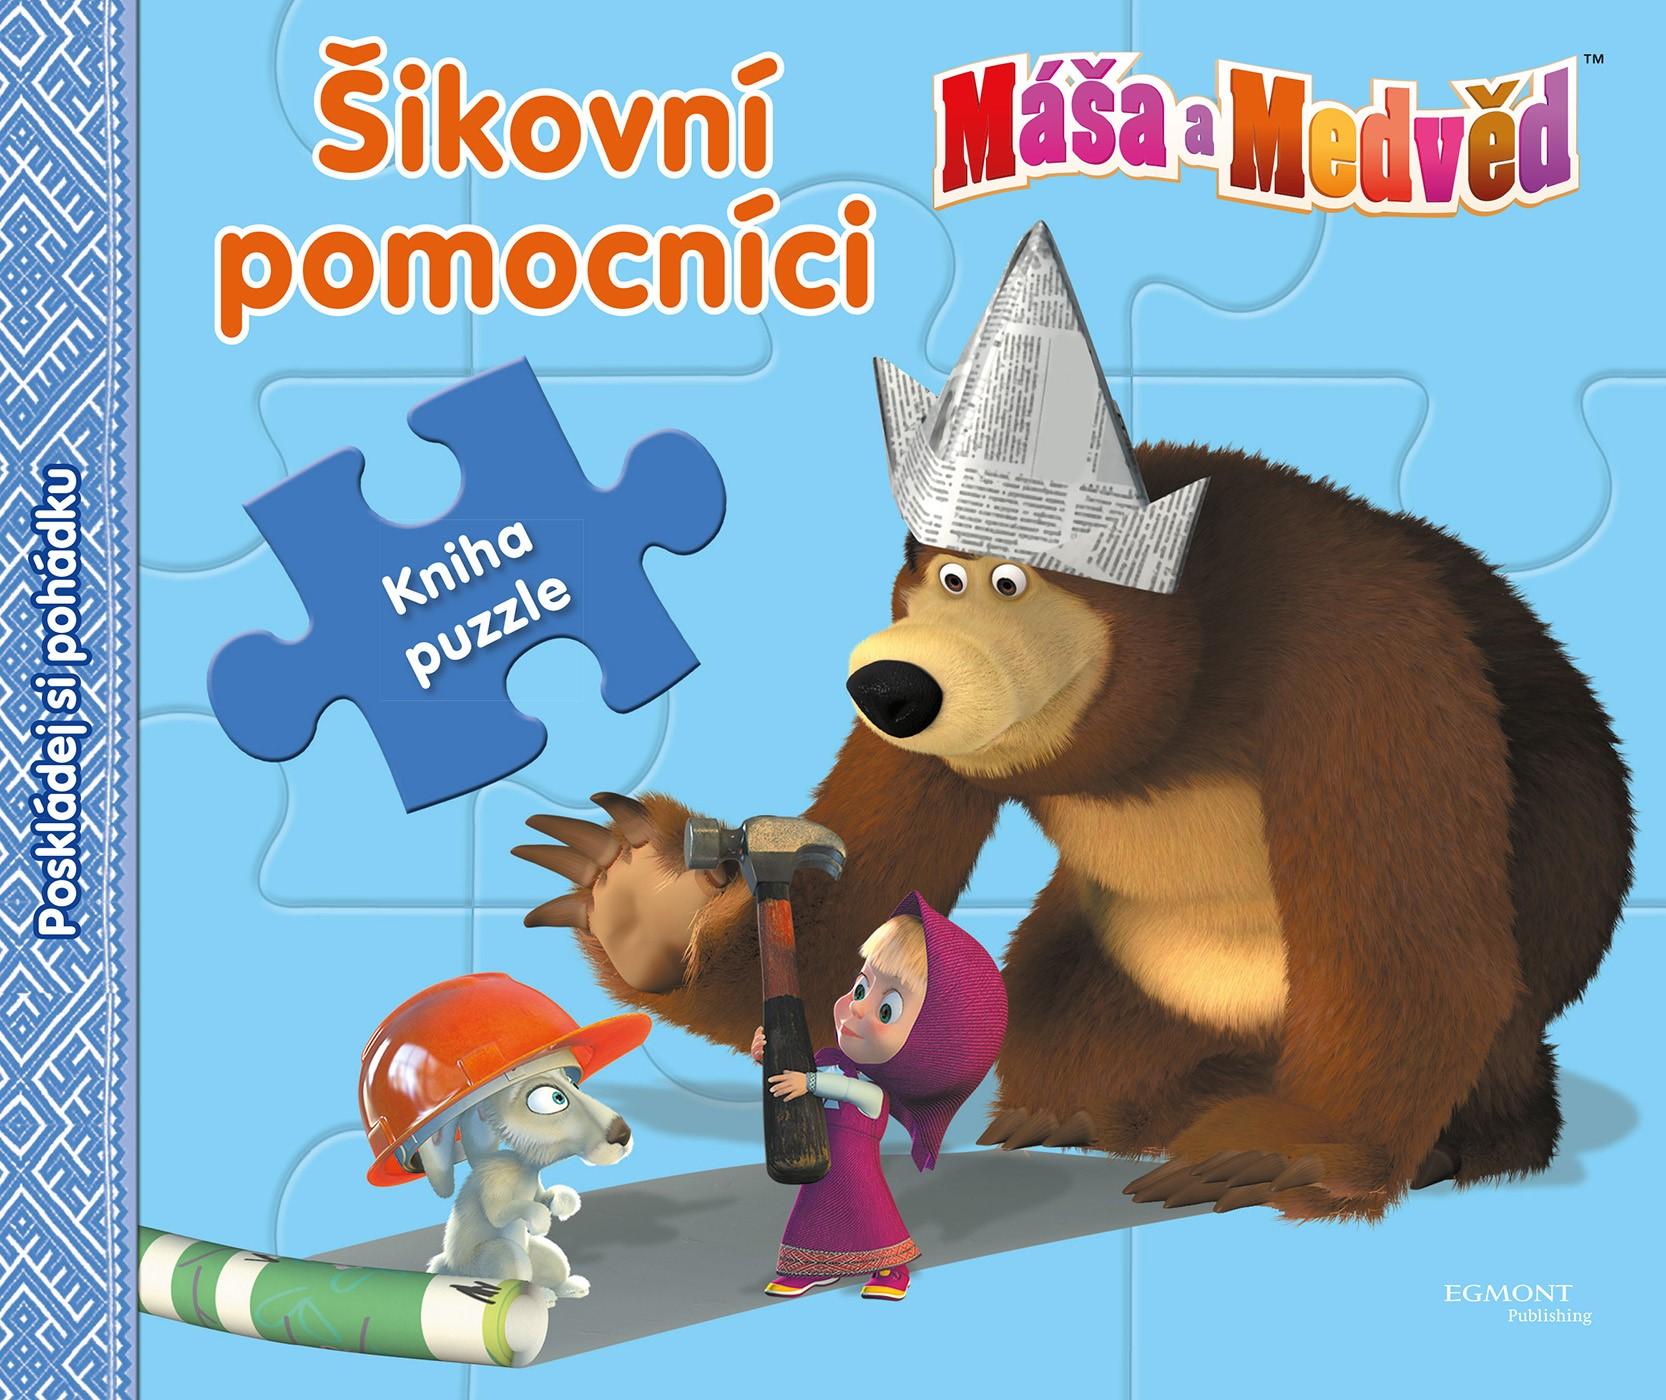 Máša a medvěd - Šikovní pomocníci - Kniha puzzle - Poskládej si pohádku |